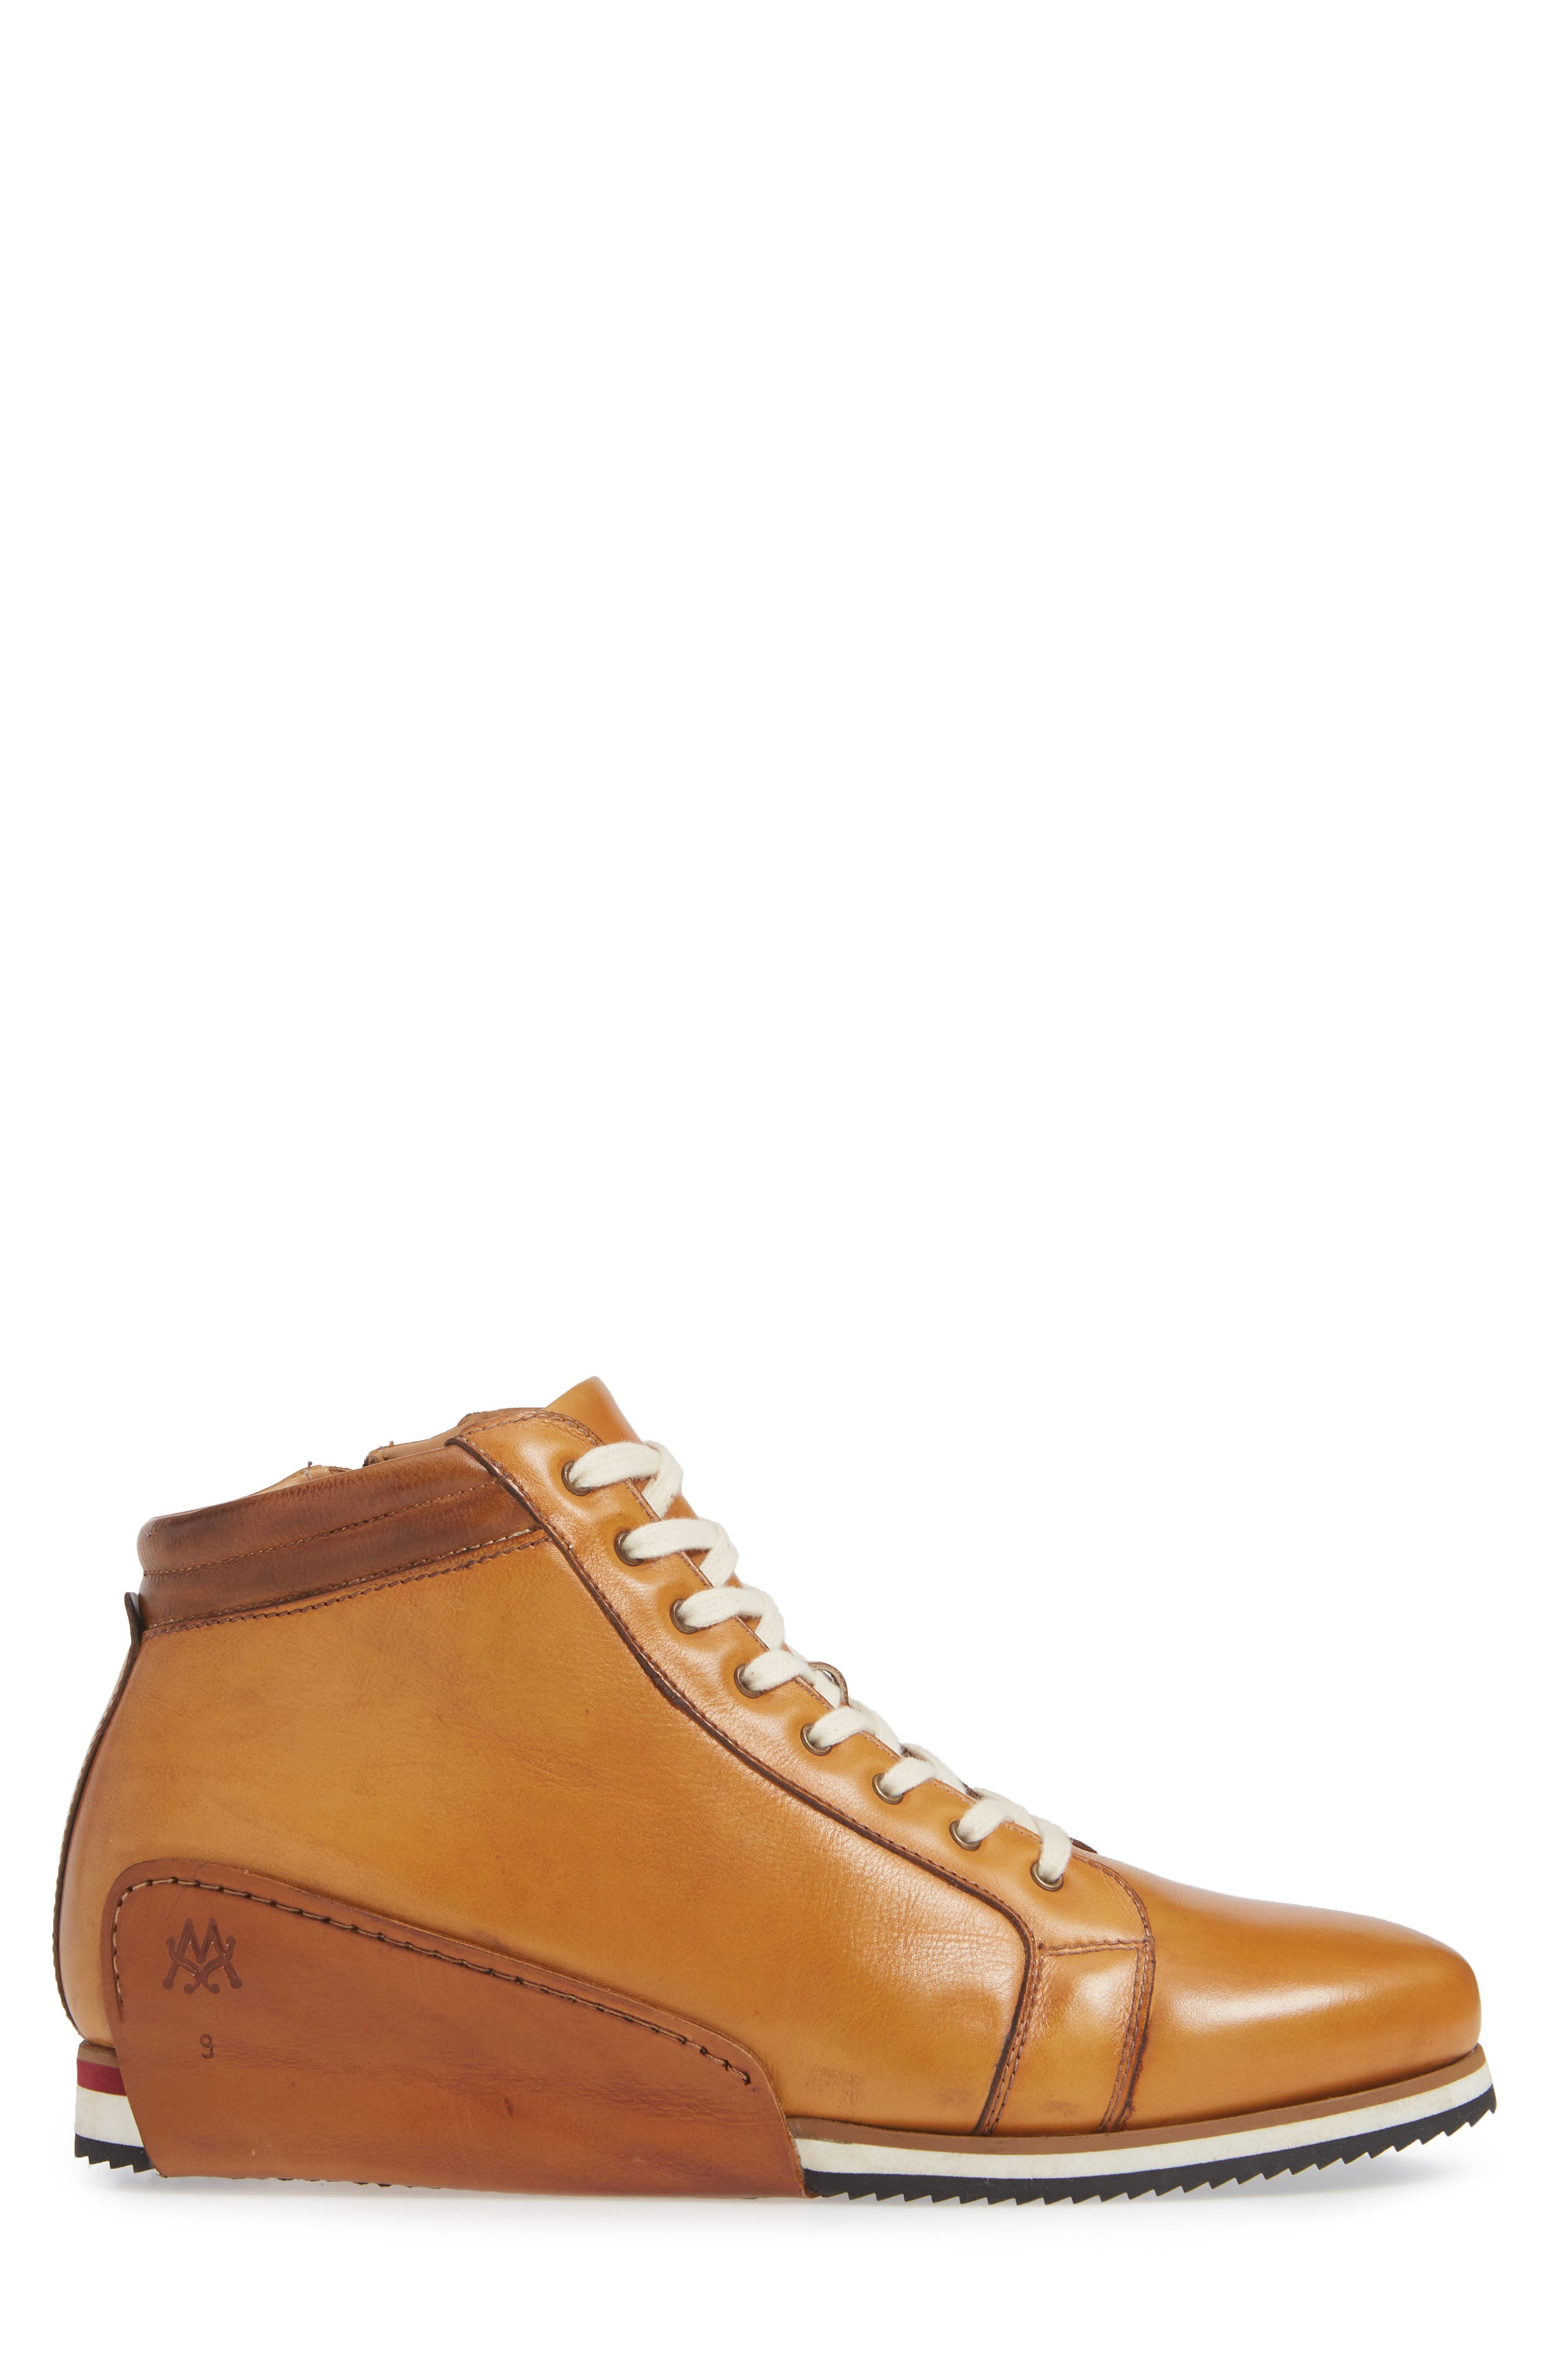 Niro Sneaker,                             Alternate thumbnail 3, color,                             TAN LEATHER